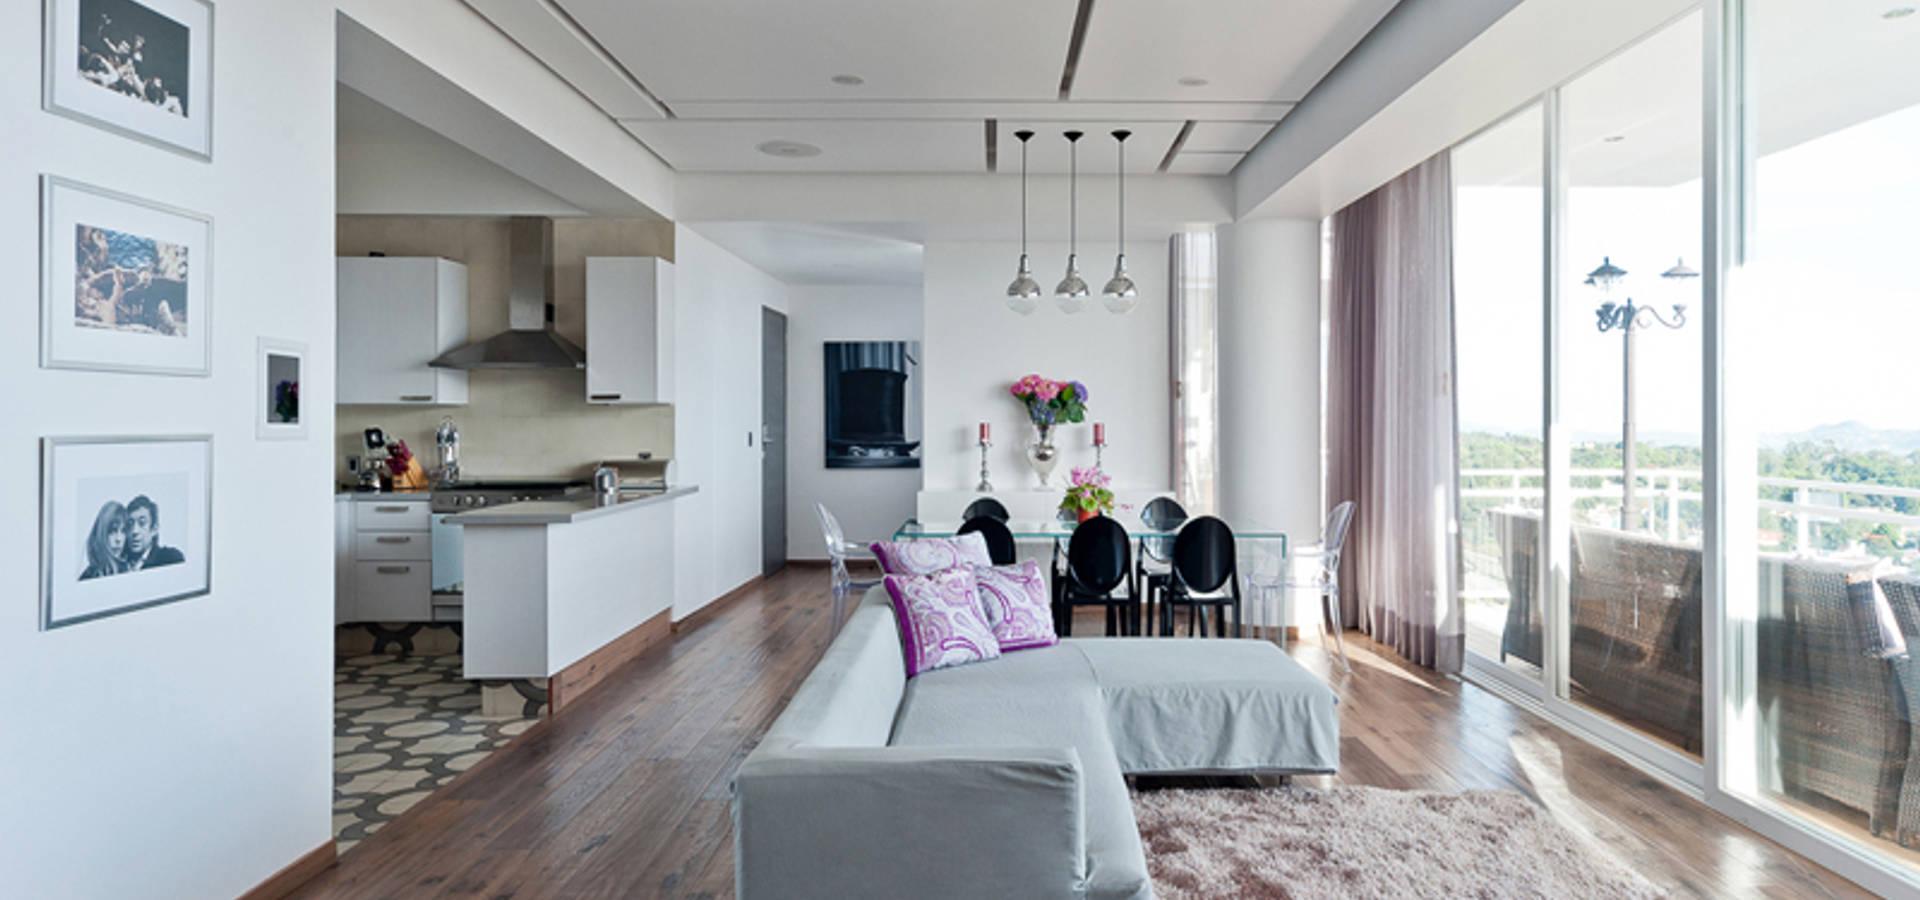 ho arquitectura de interiores arquitectos de interiores